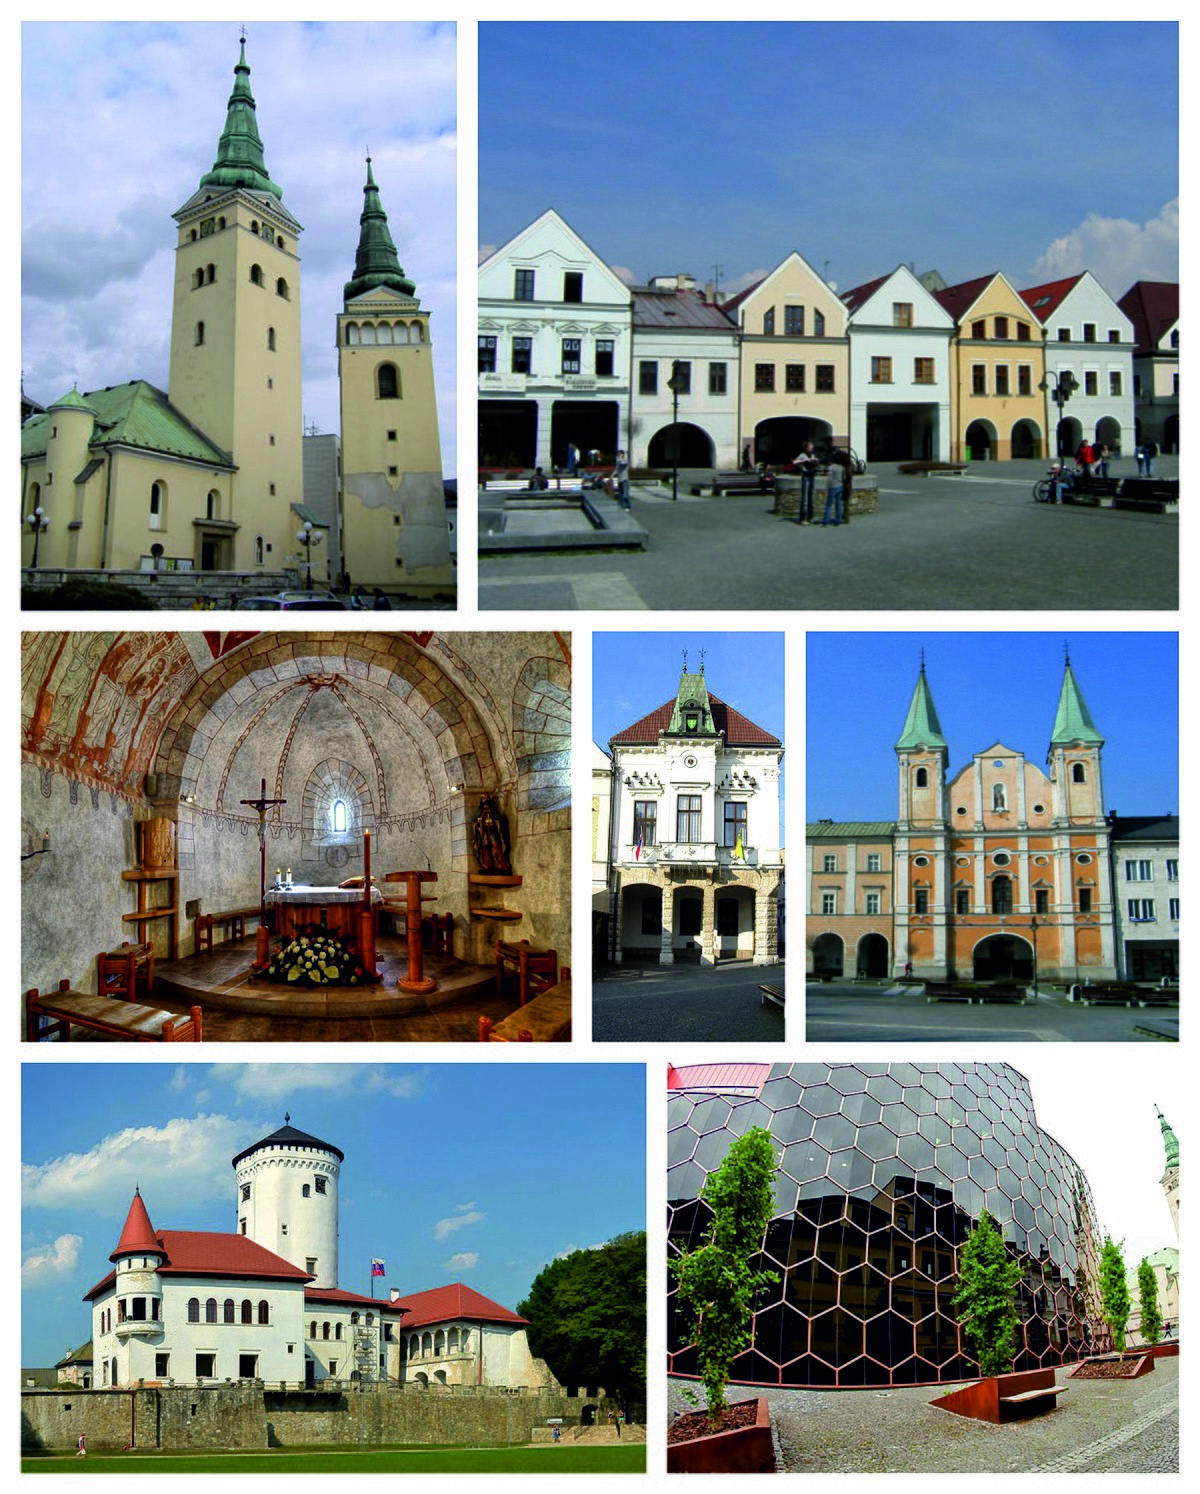 Žilina - Wikipedia 6a71159411